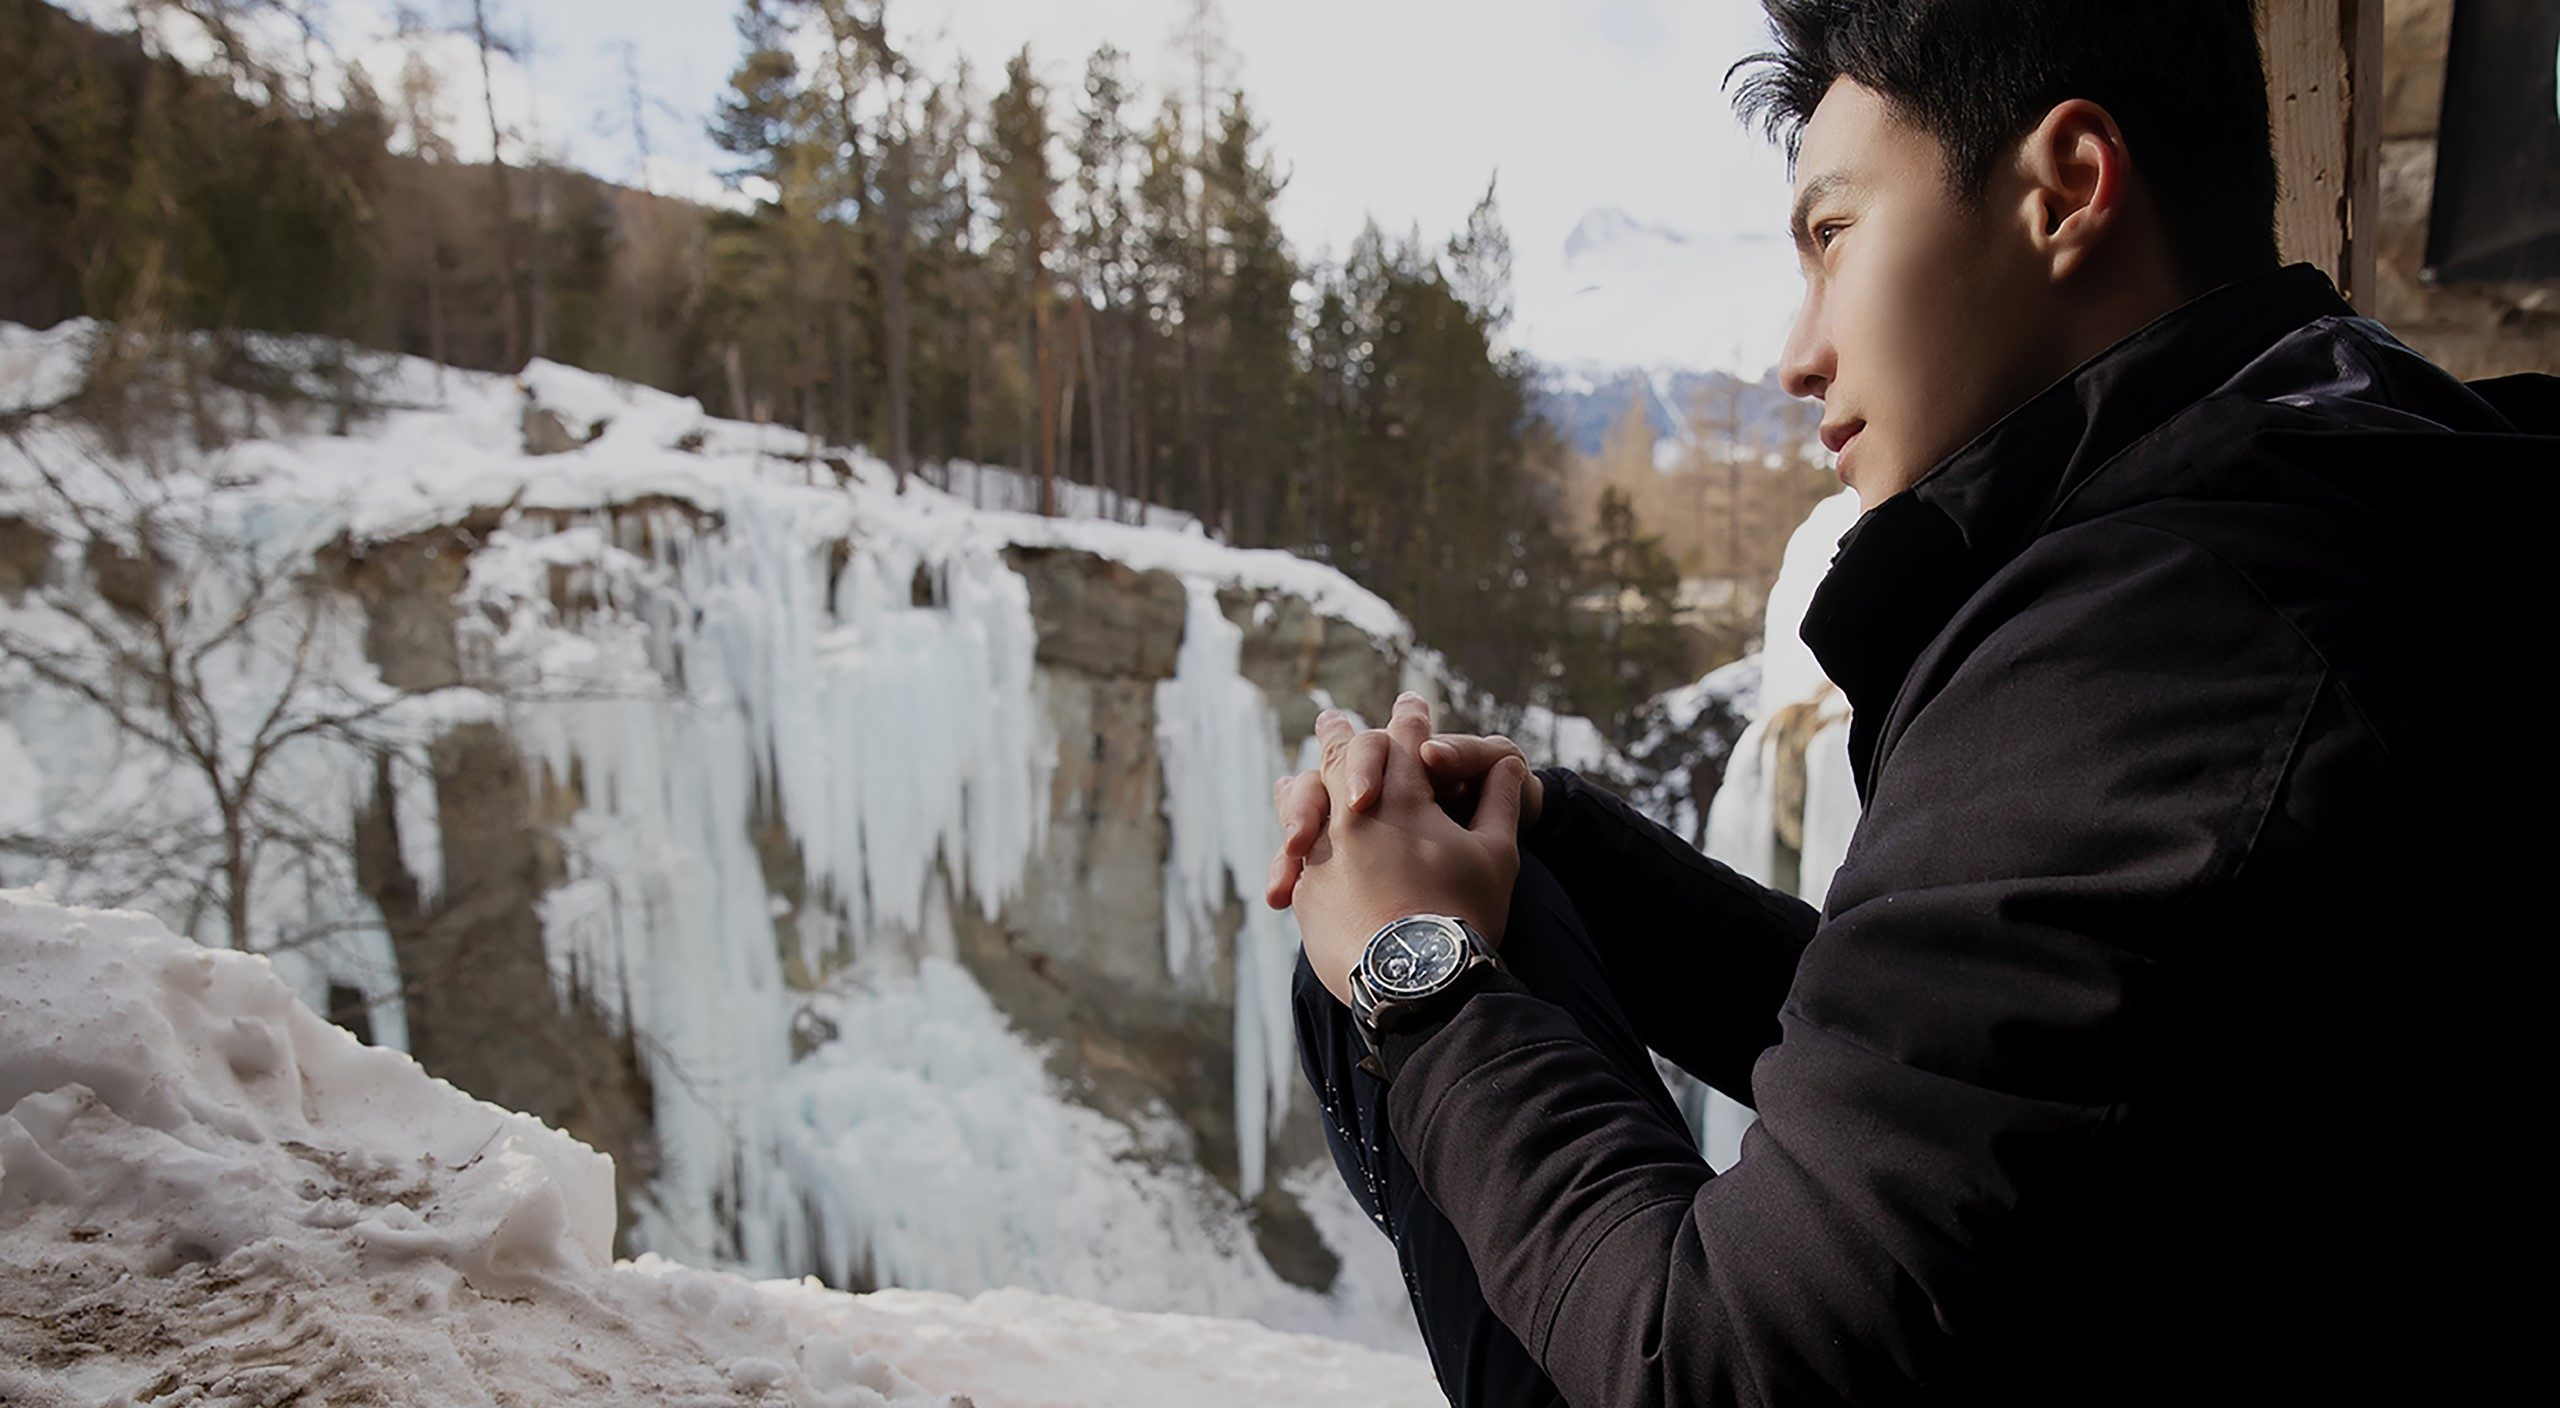 Watches & Wonders 2020: Montblanc 1858 Timepieces